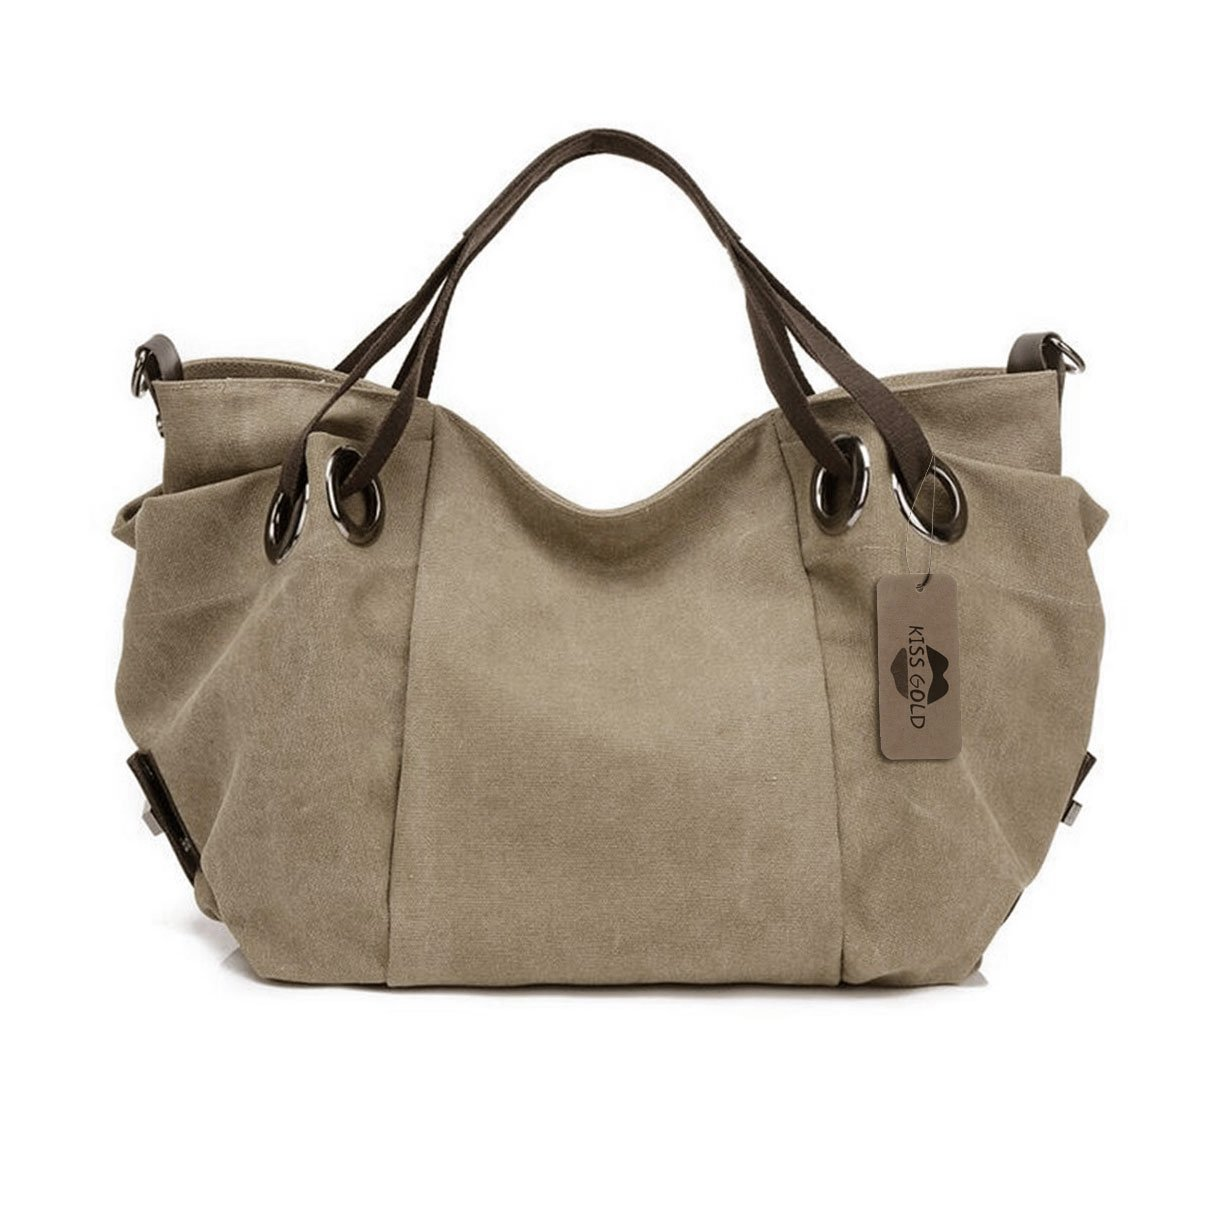 KISS GOLD(TM) Women's Canvas Hobo Top-handle Bag Crossbody Shoulder Bag, European Style, Large Size 16''X6.8''X12'', Light Khaki